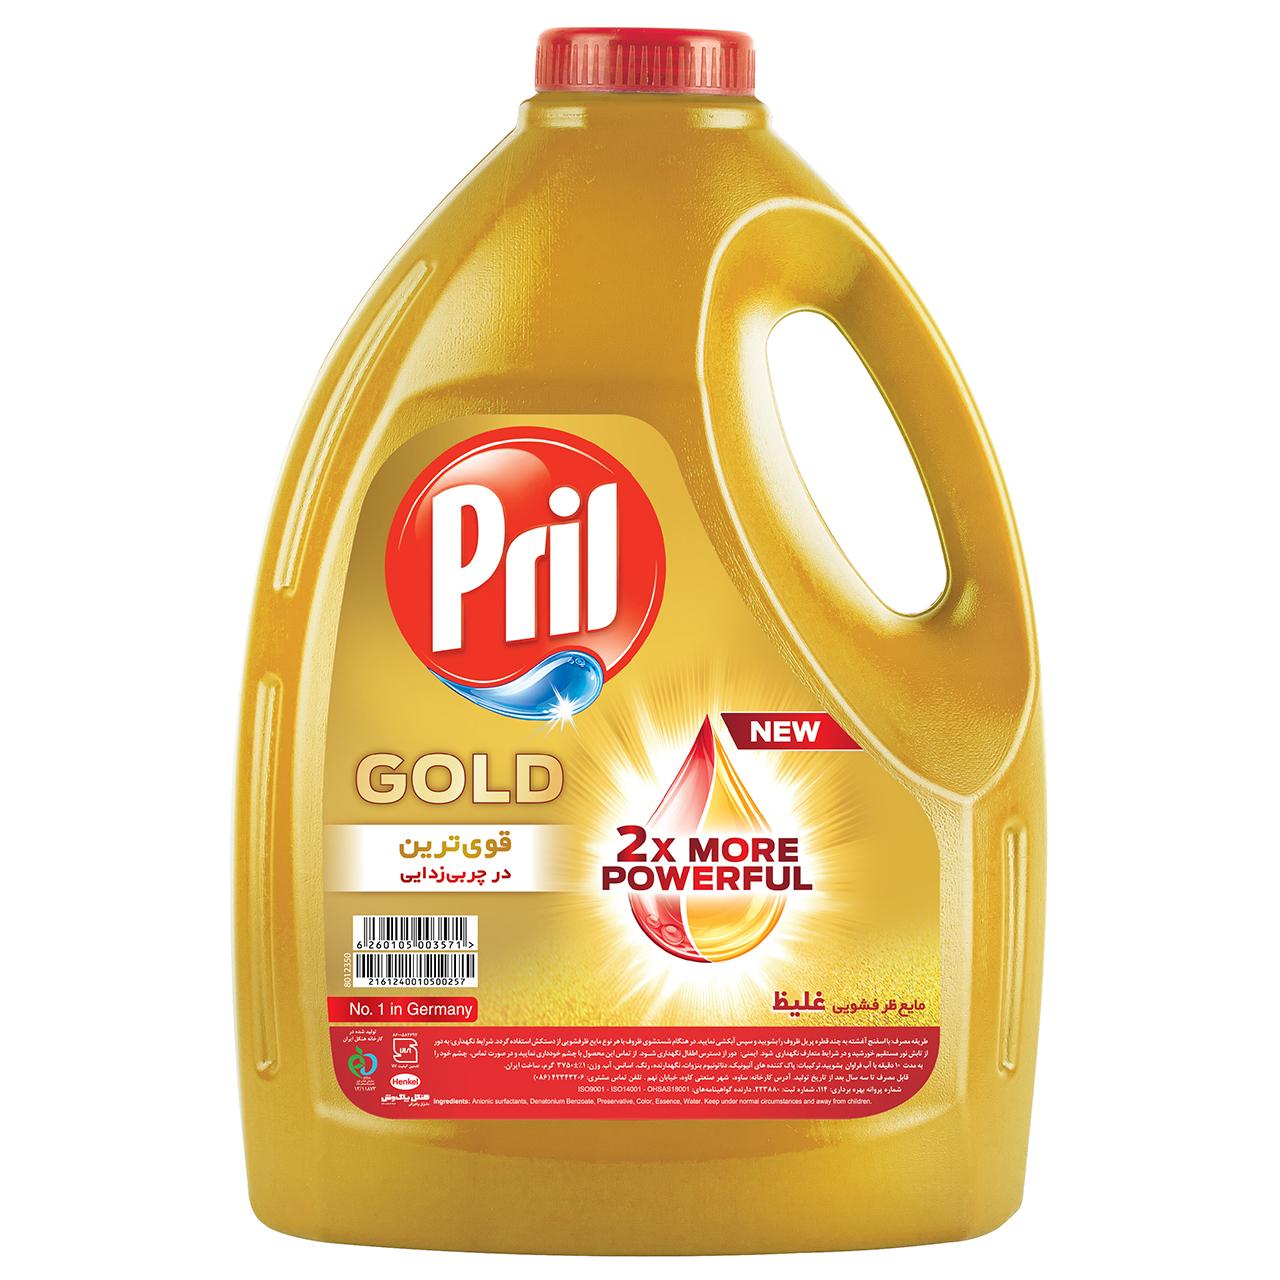 مایع ظرفشویی پریل طلایی - 3.75 کیلوگرم